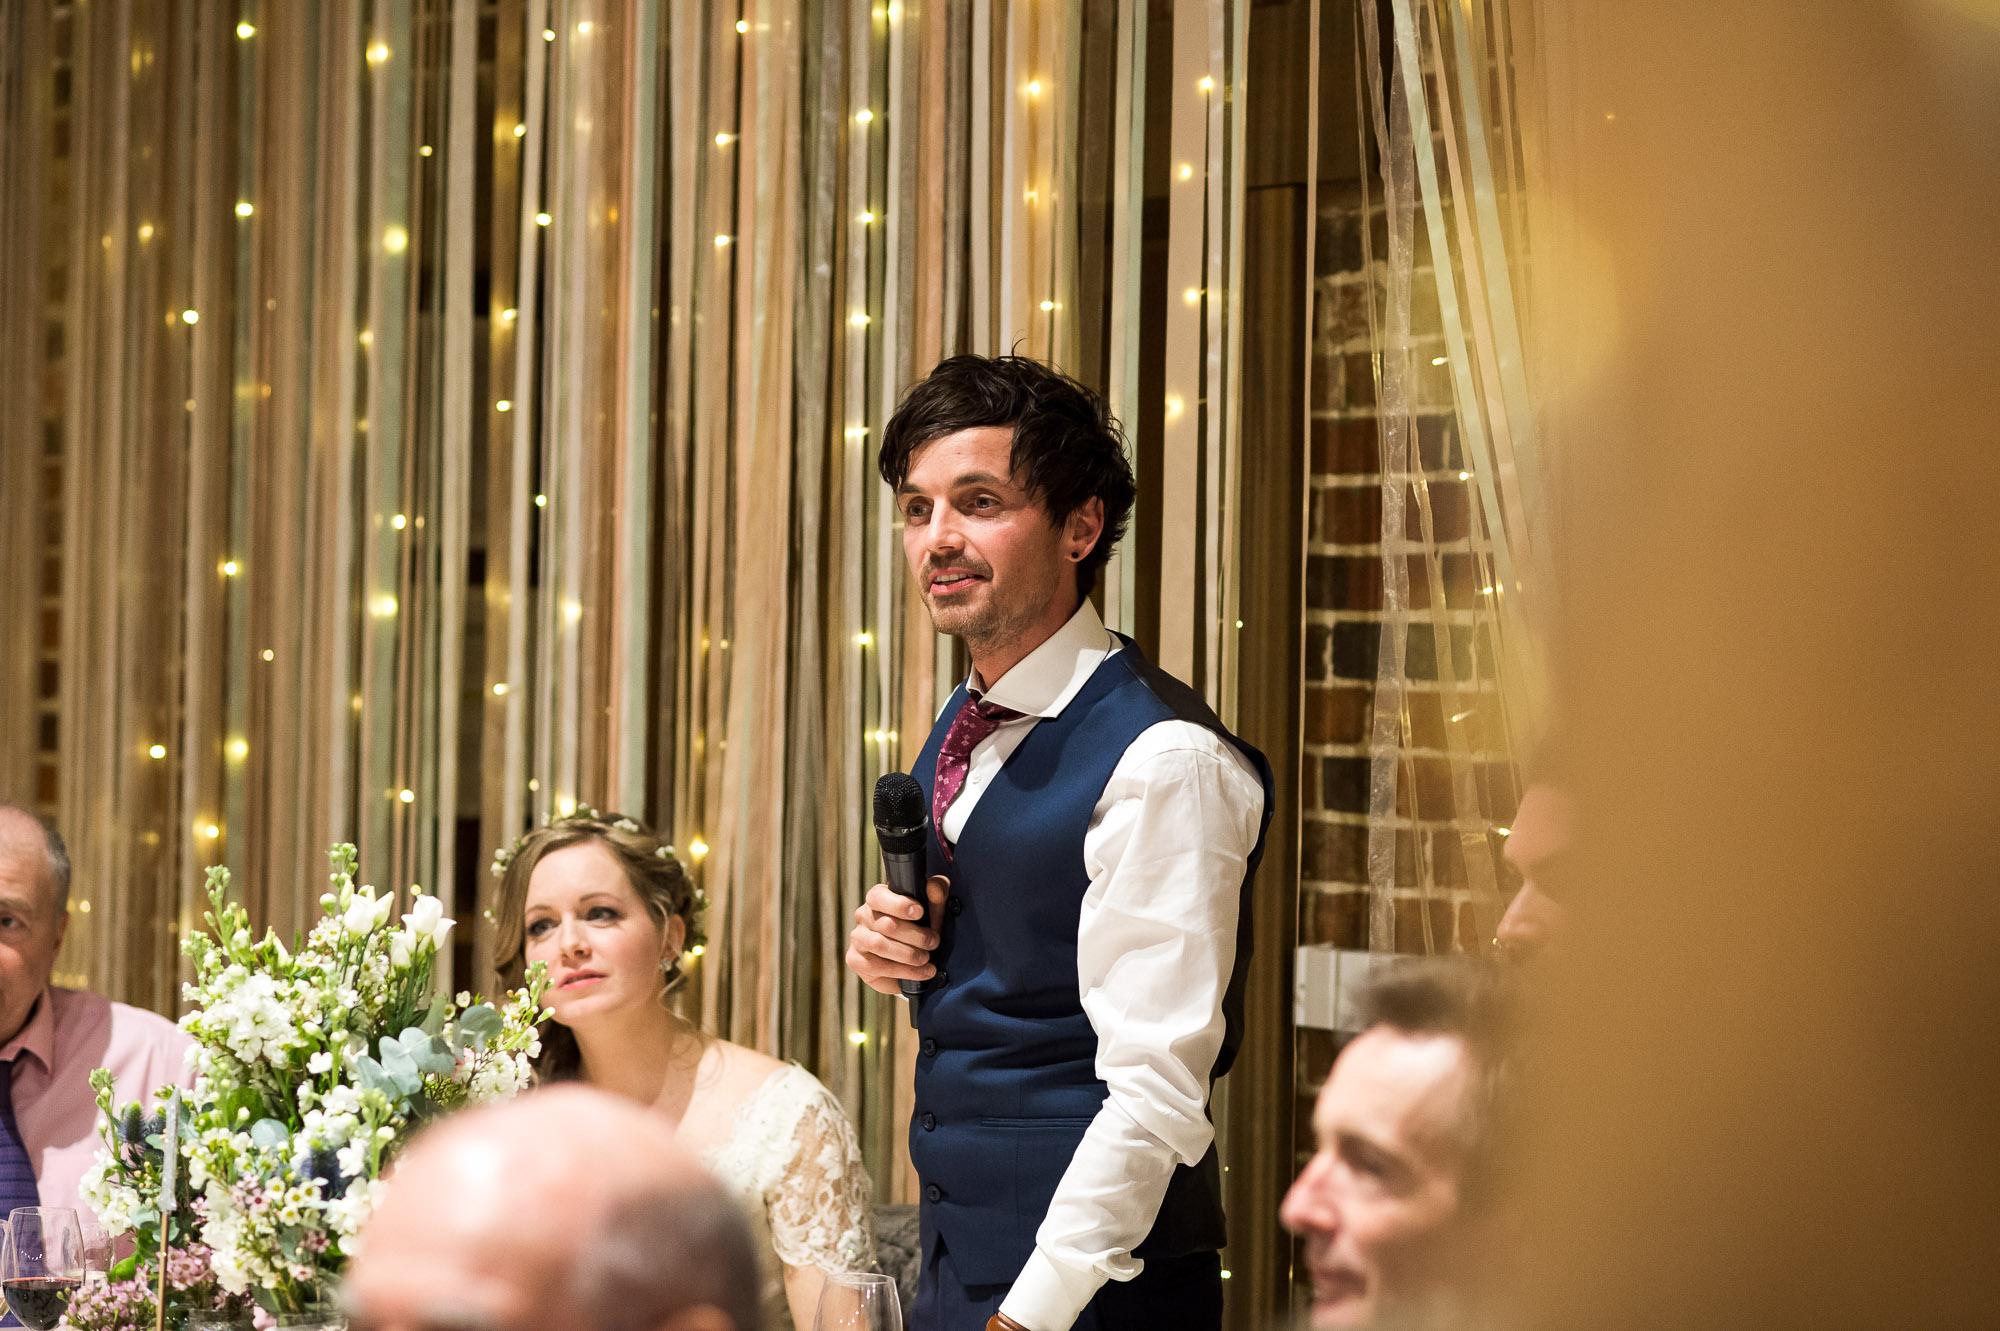 Grooms wedding speech Essex Barn wedding